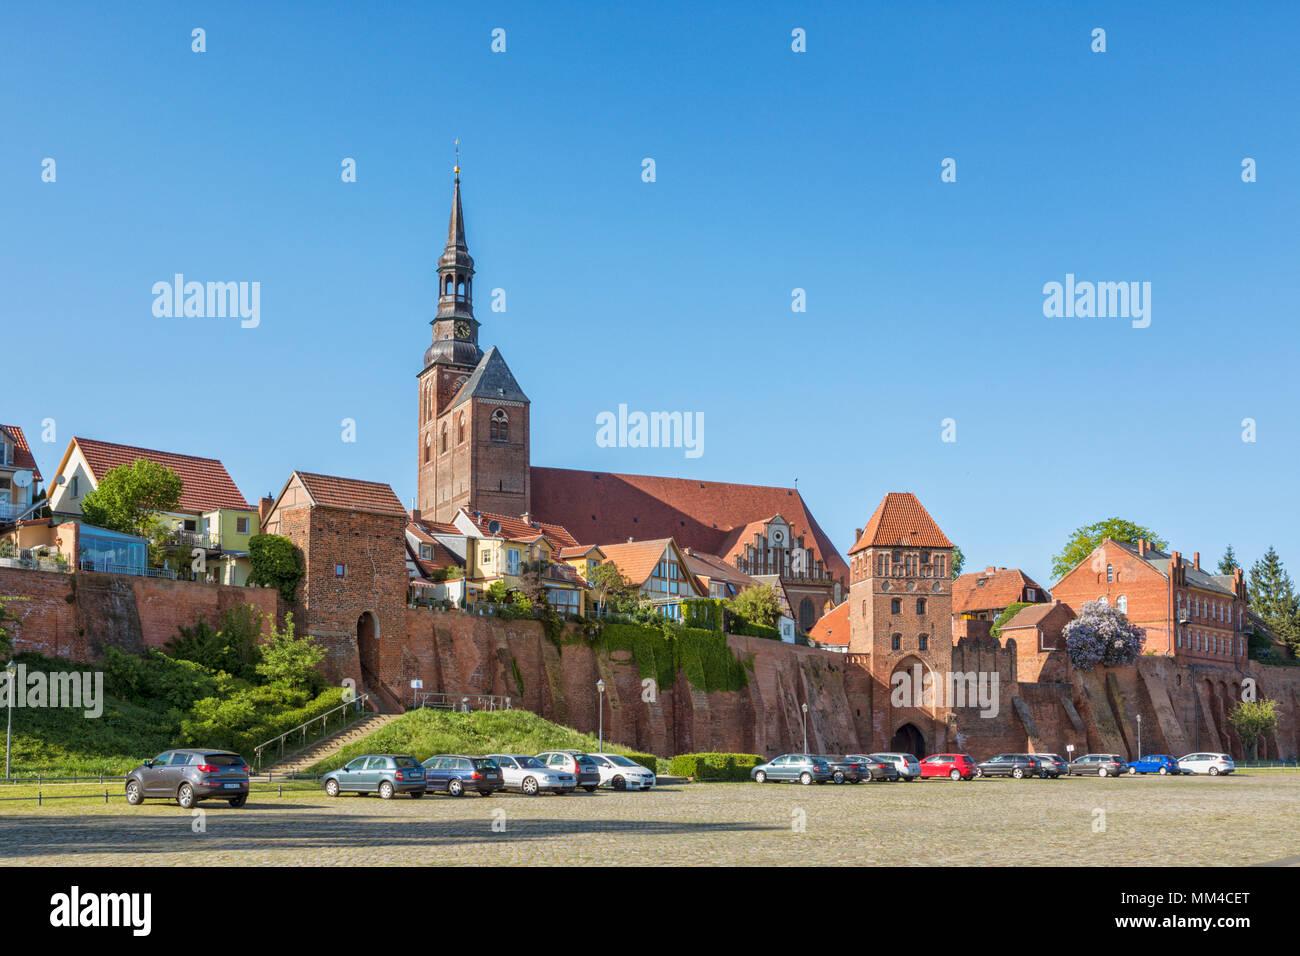 Tangermünde cityscape, Saxony-Anhalt, Germany - Stock Image